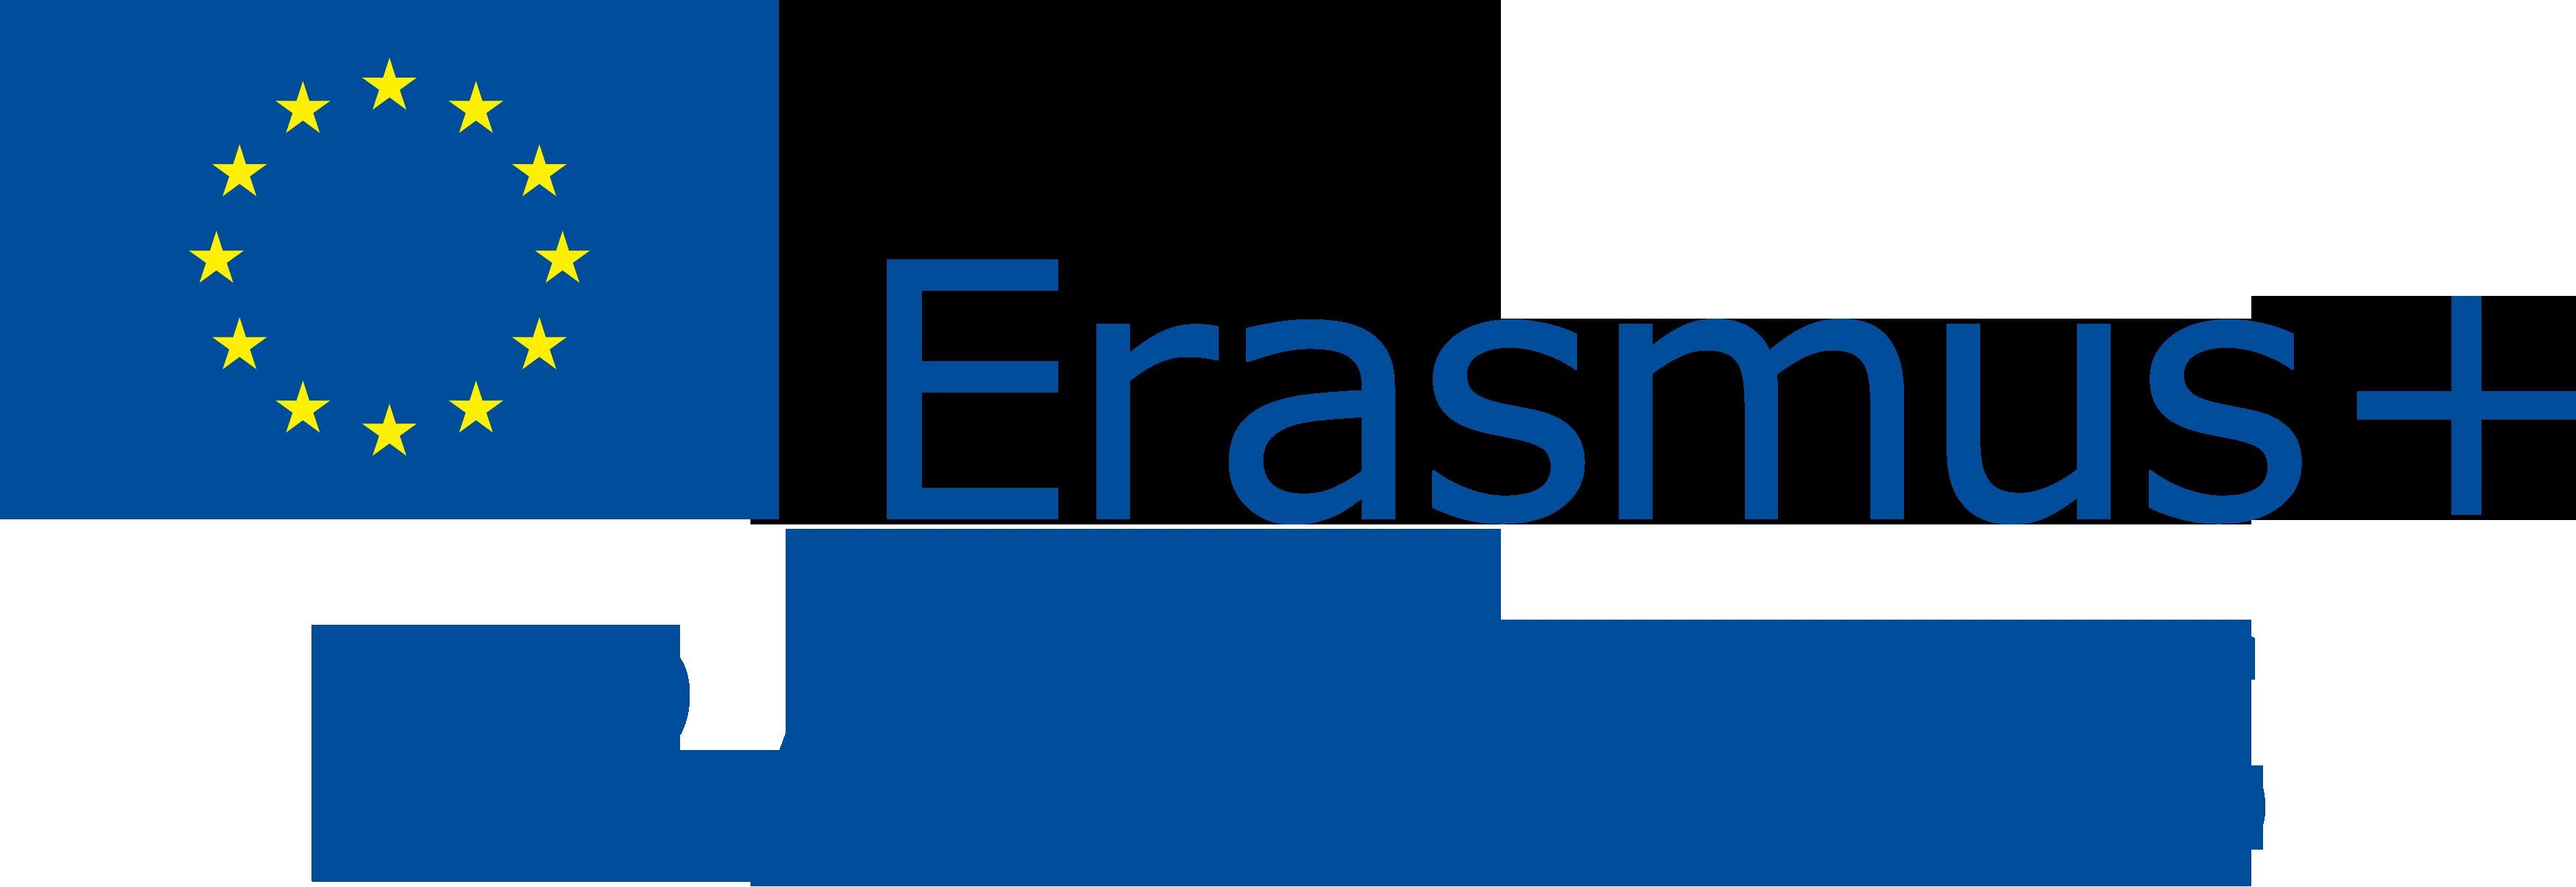 Ampliación del plazo de realización de movilidades para prácticas curriculares Erasmus+ Prácticas 2019-20